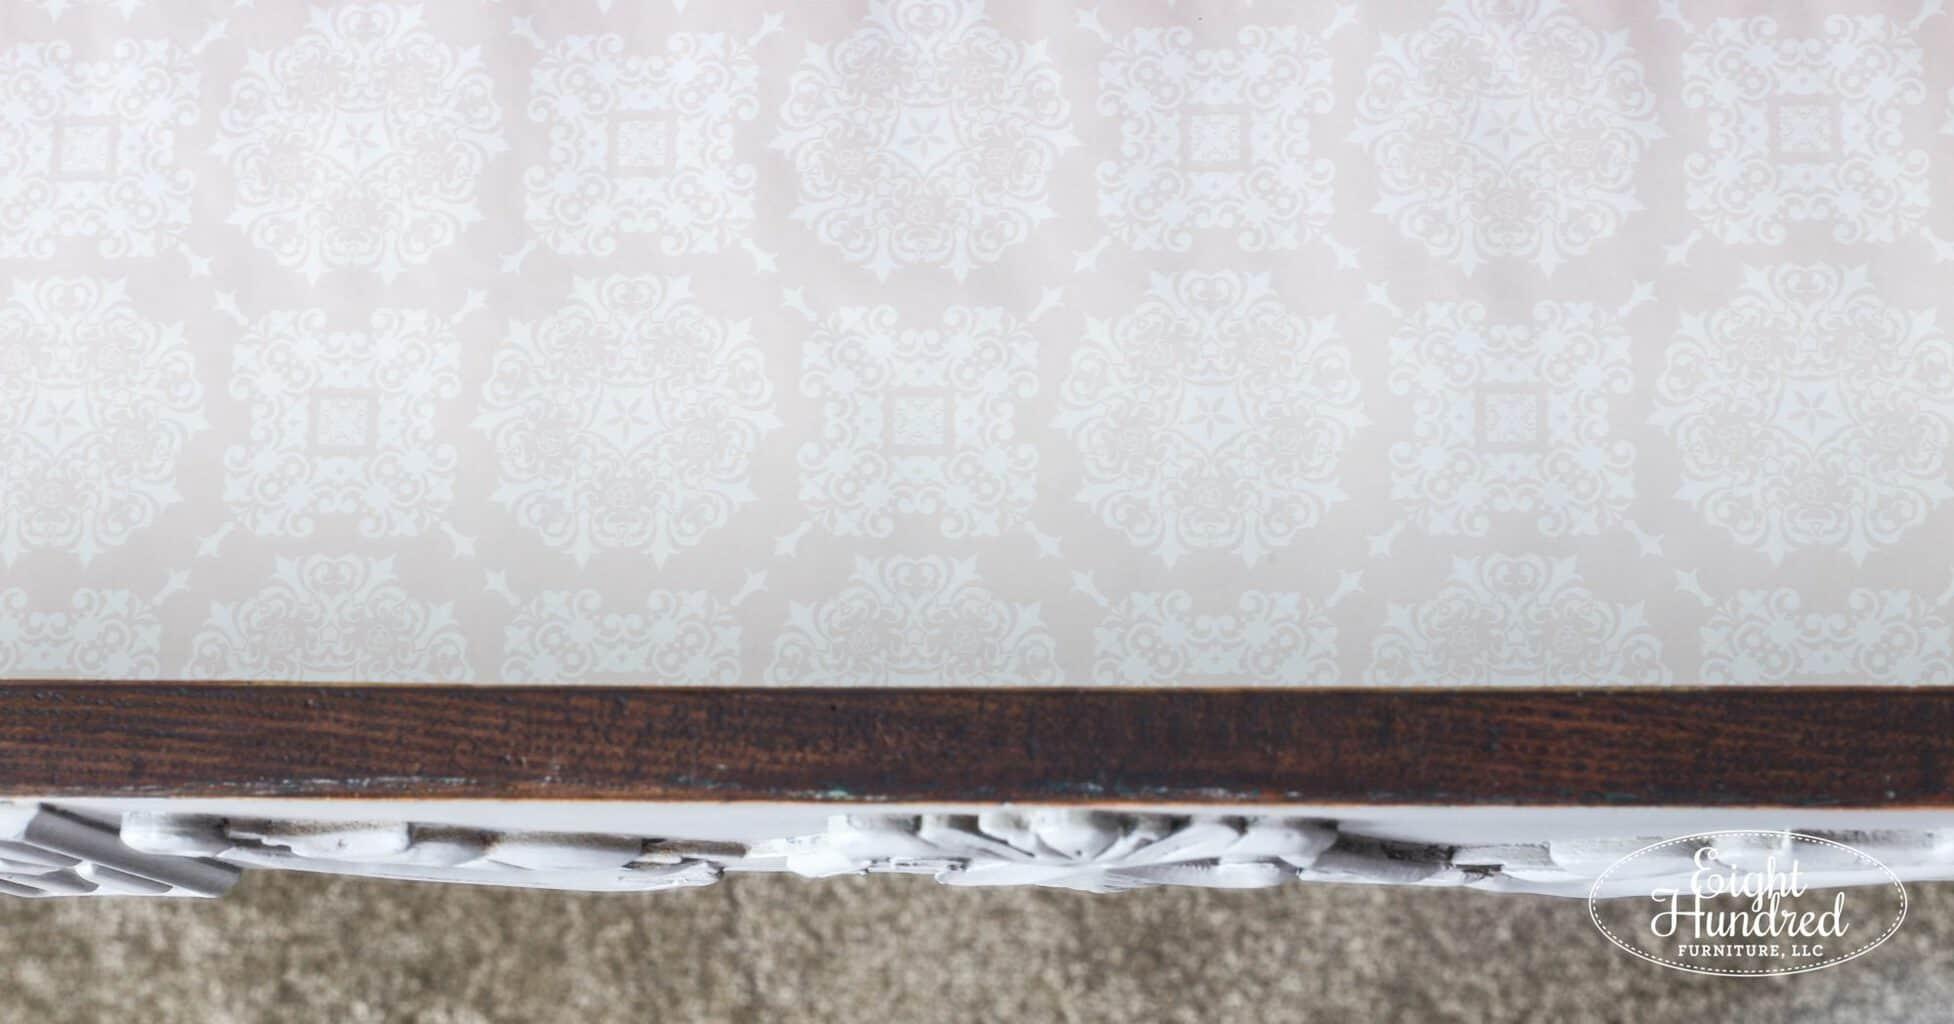 Pink drawer liner in French Linen dresser